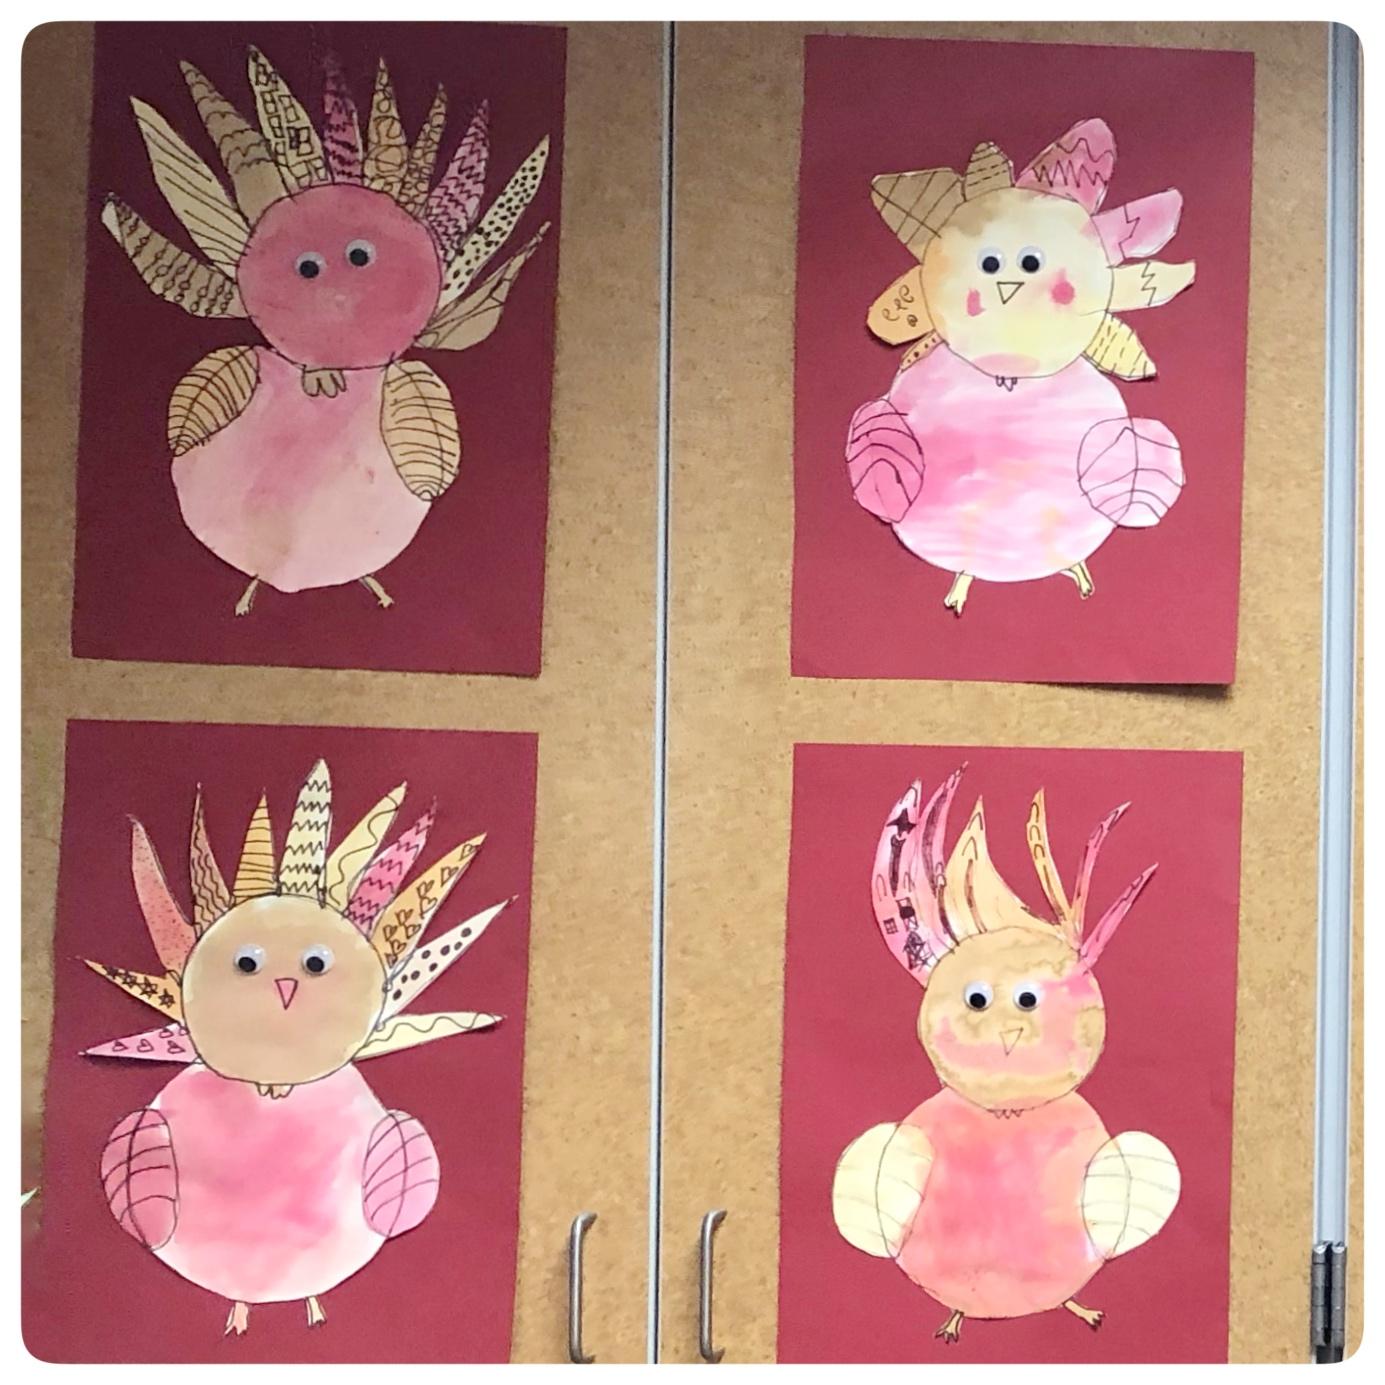 Wild Turkeys created by First Graders